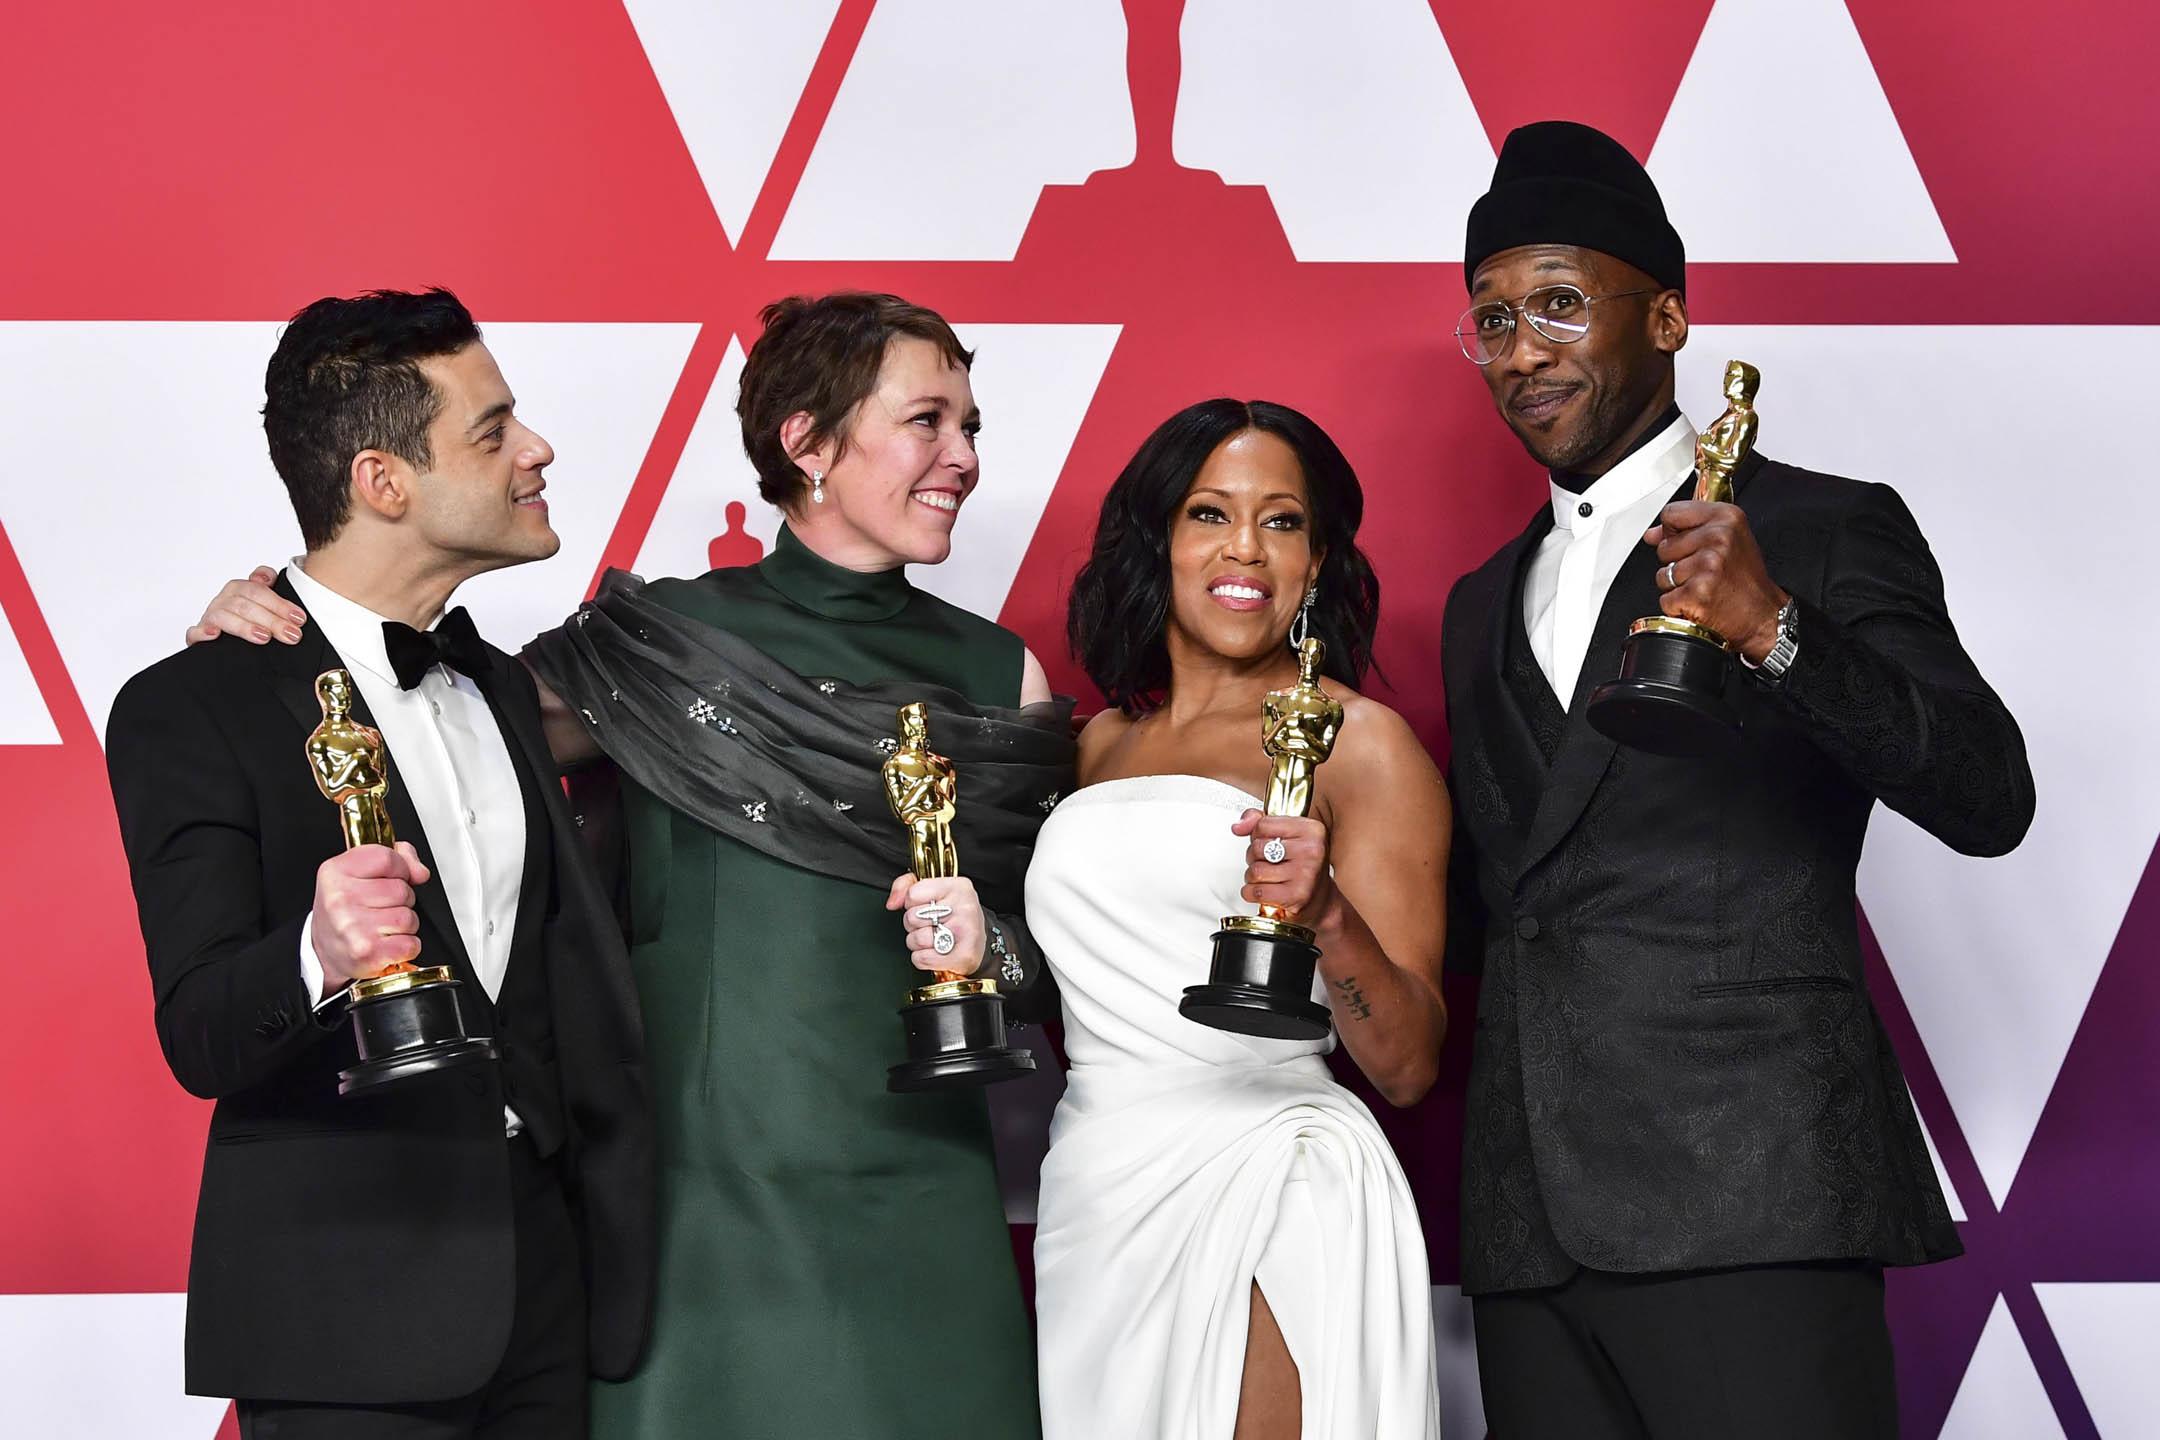 奧斯卡四位表演獎項得主,最佳男主角《Bohemian Rhapsody》Rami Malek、最佳女主角《The Favourite》Olivia Colman、最佳女配角《If Beale Street Could Talk》Regina King及最佳男配角《Green Book》Mahershala Ali。 攝:Frederic J. Brown/AFP/Getty Images